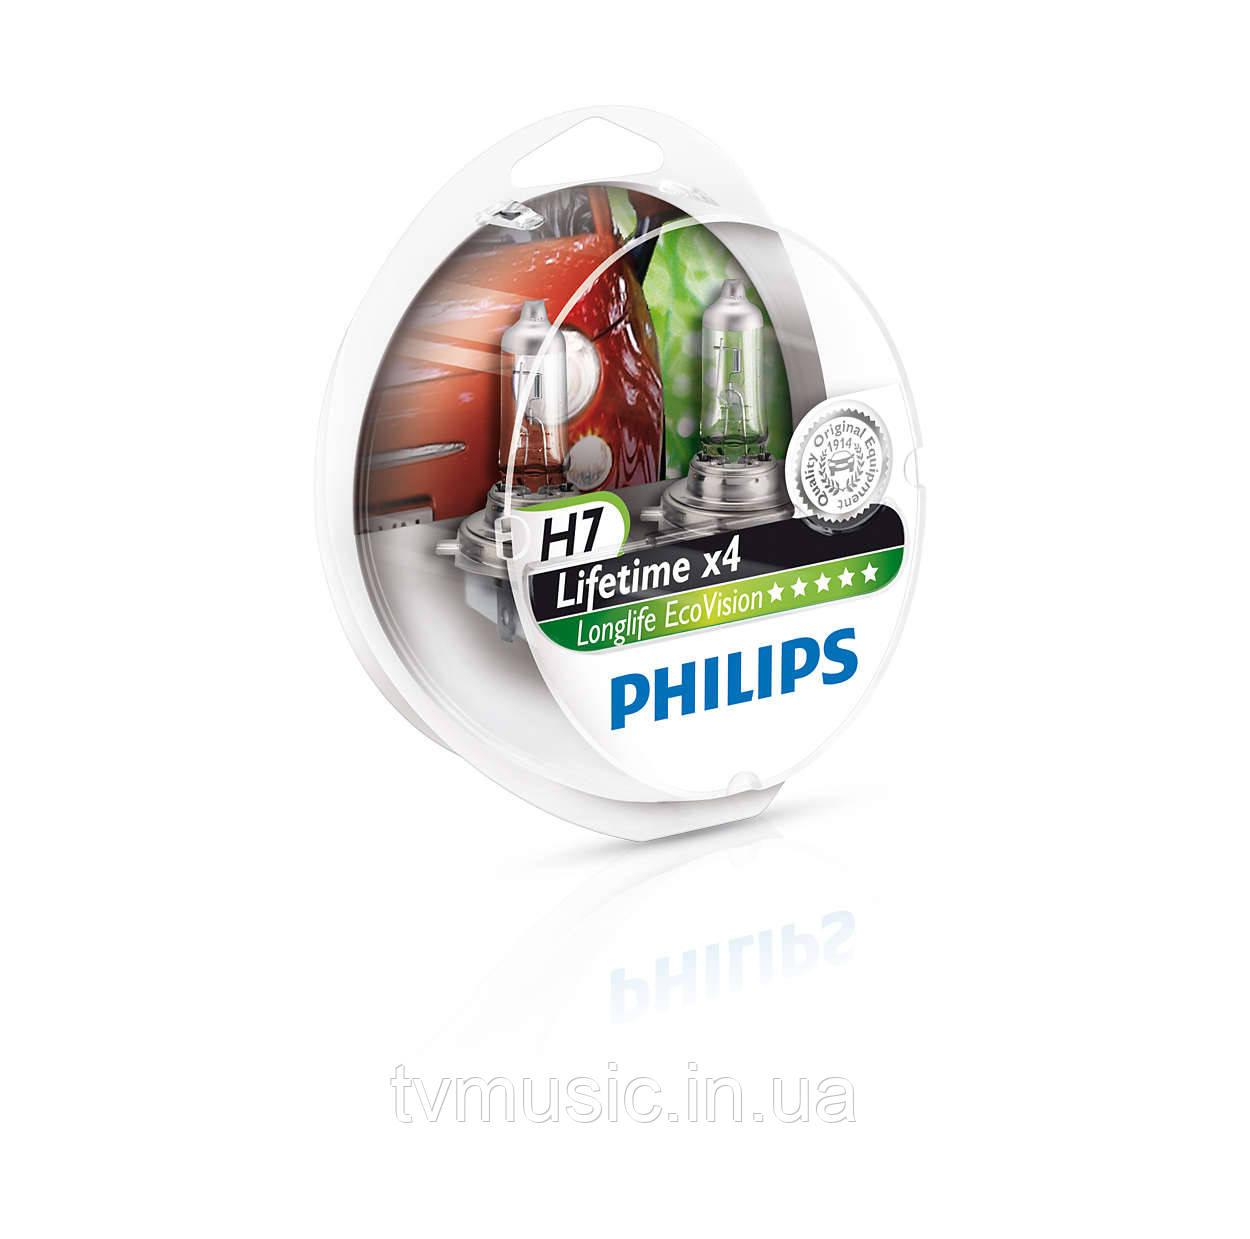 Галогенные лампы Philips LongLife EcoVision H7 12V 55W (12972LLECOS2)